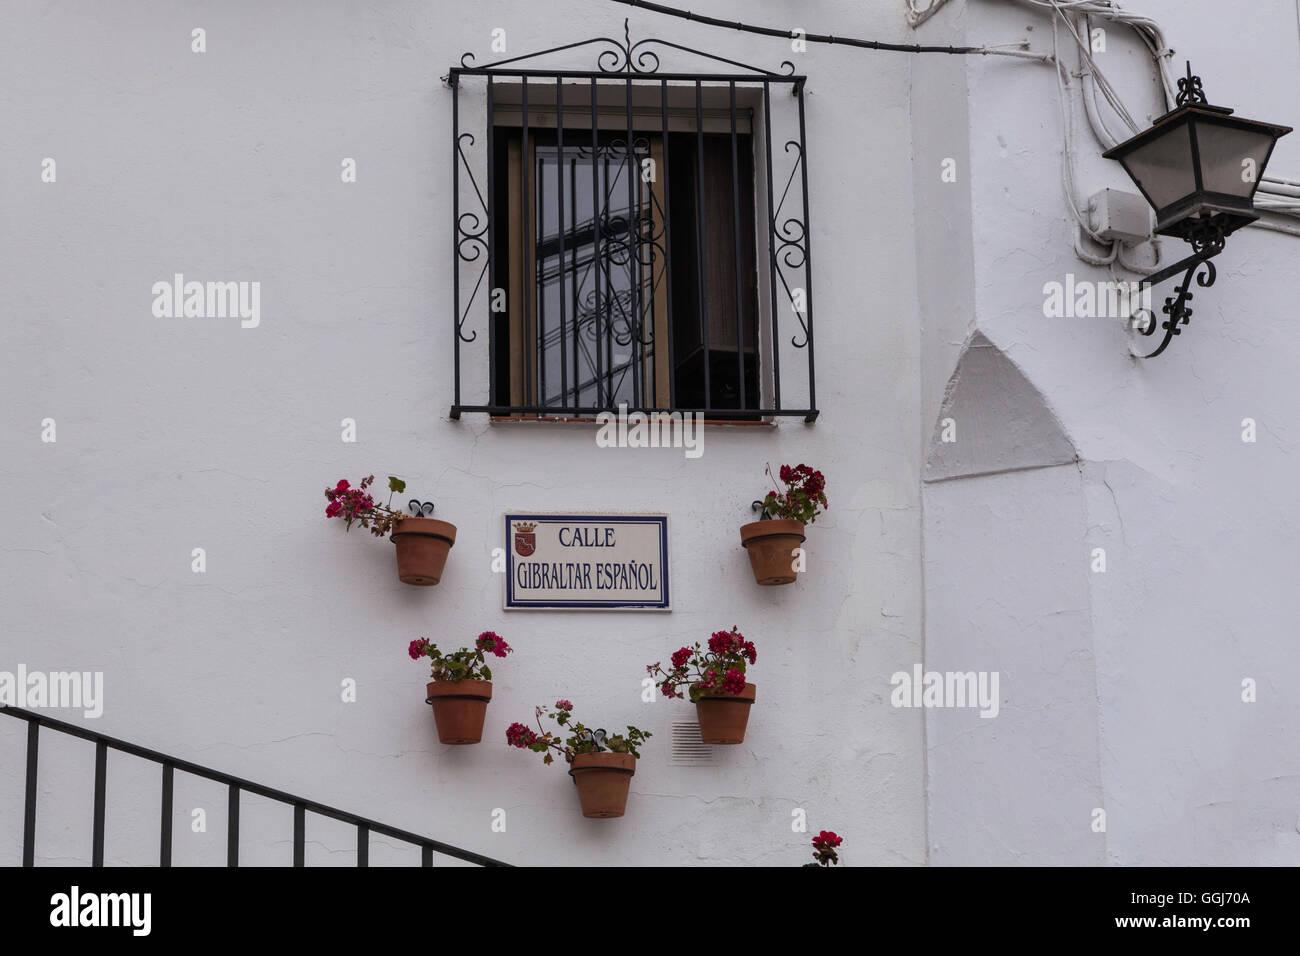 A house showing a street sign i Sahara de la Sierra. - Stock Image